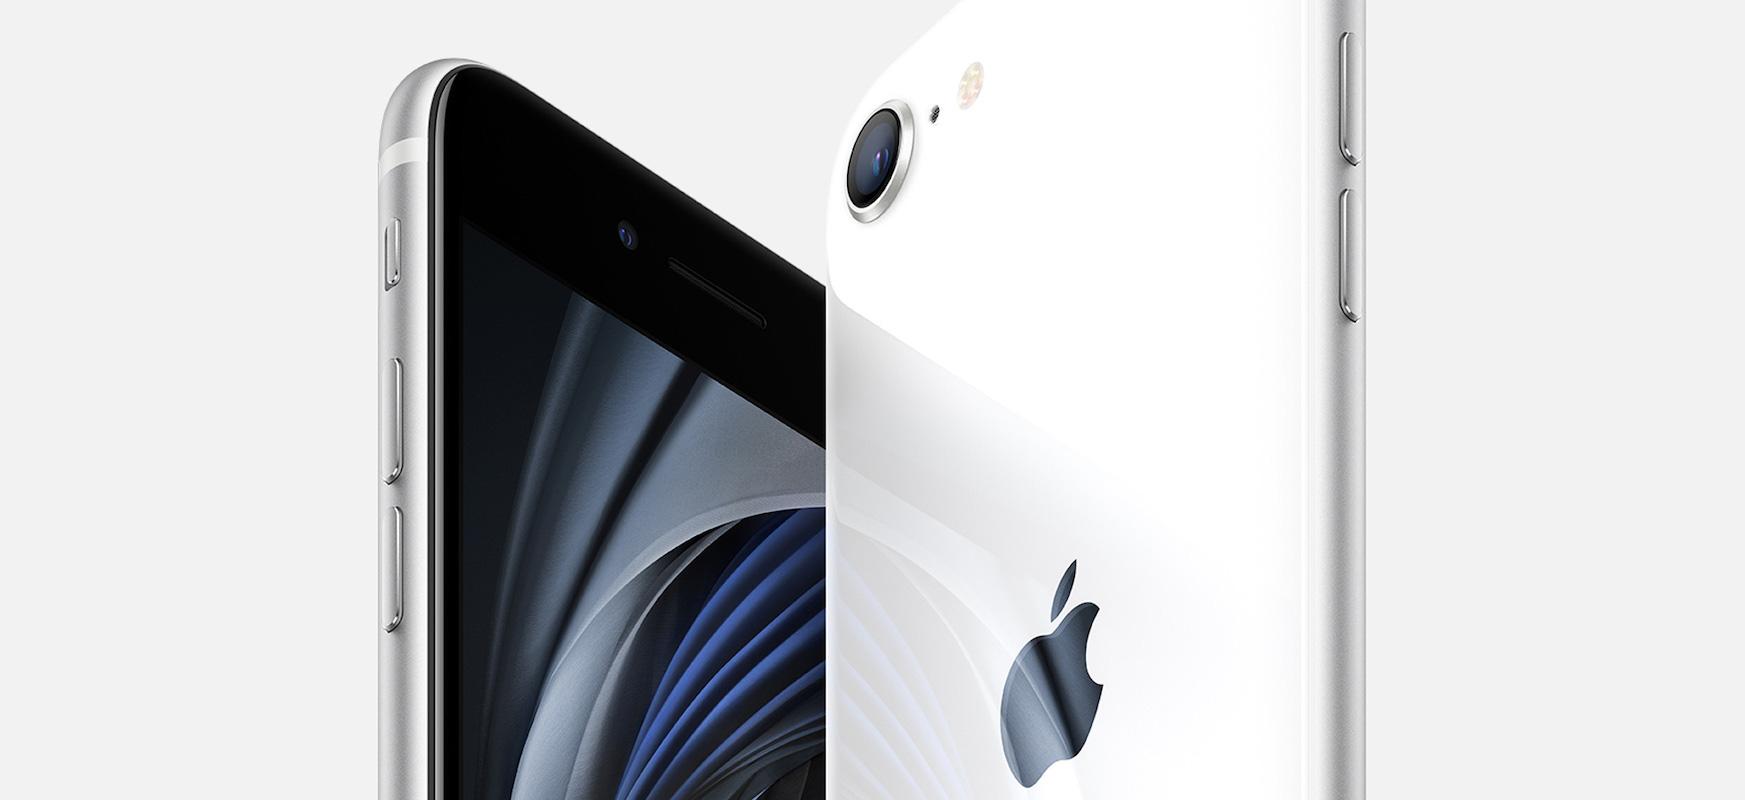 iphone-se-2020-price-specification-14